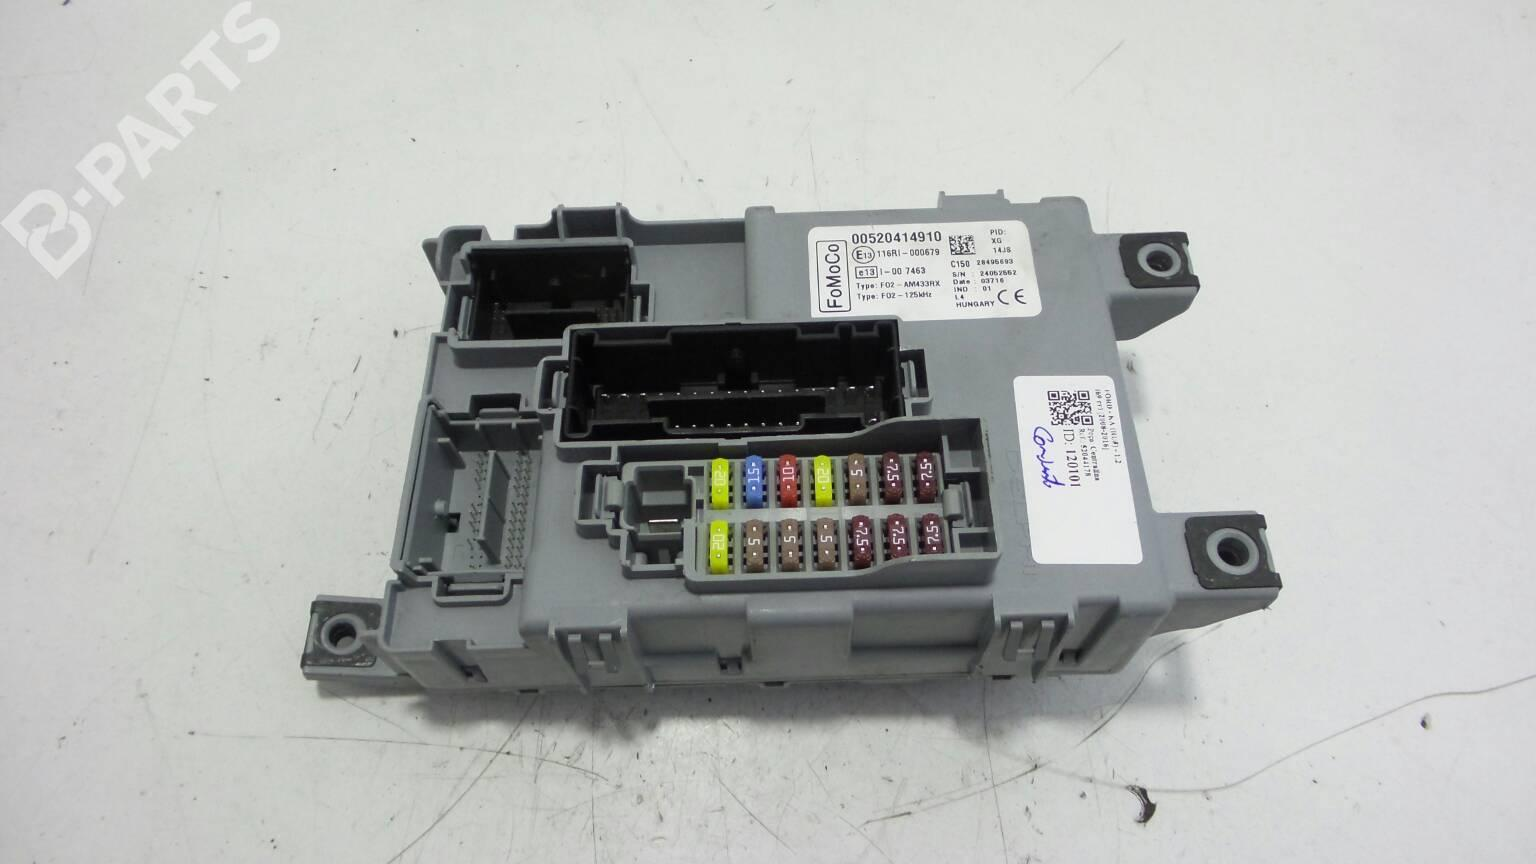 hight resolution of fuse box 00520414910 ford ka ru8 1 2 69hp fp4 2008